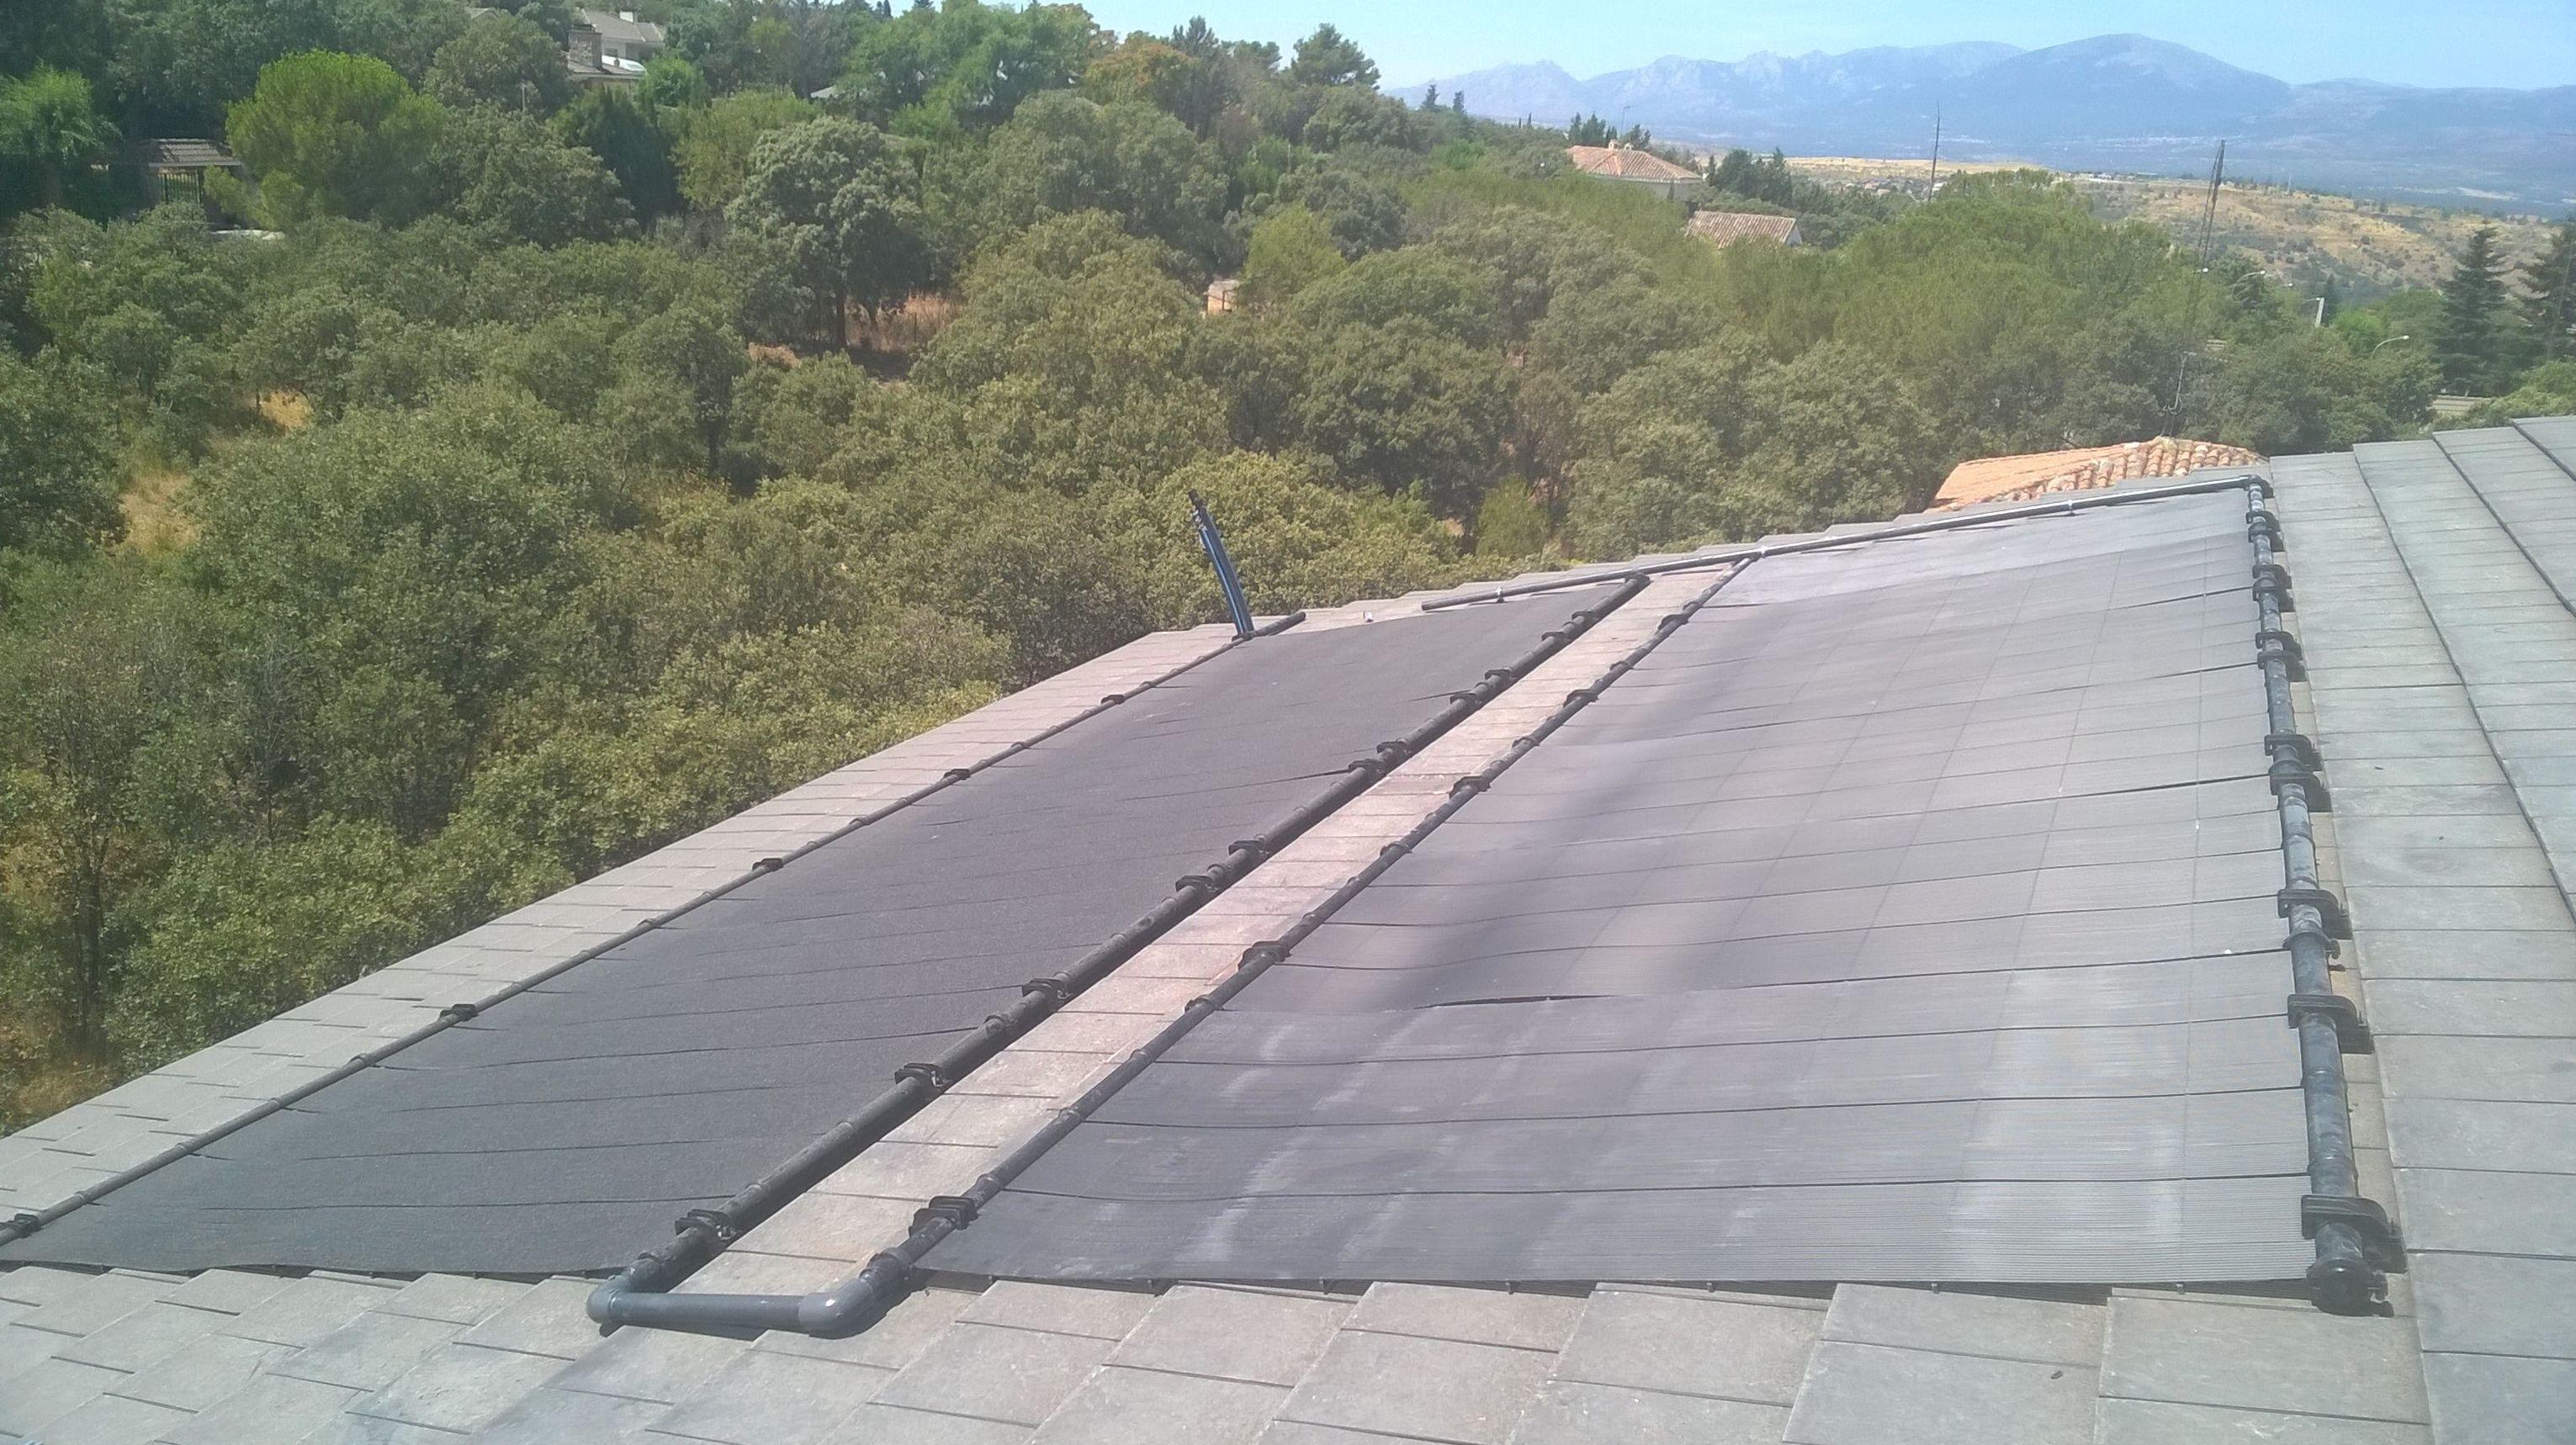 Placas solares para calentamiento de piscina.